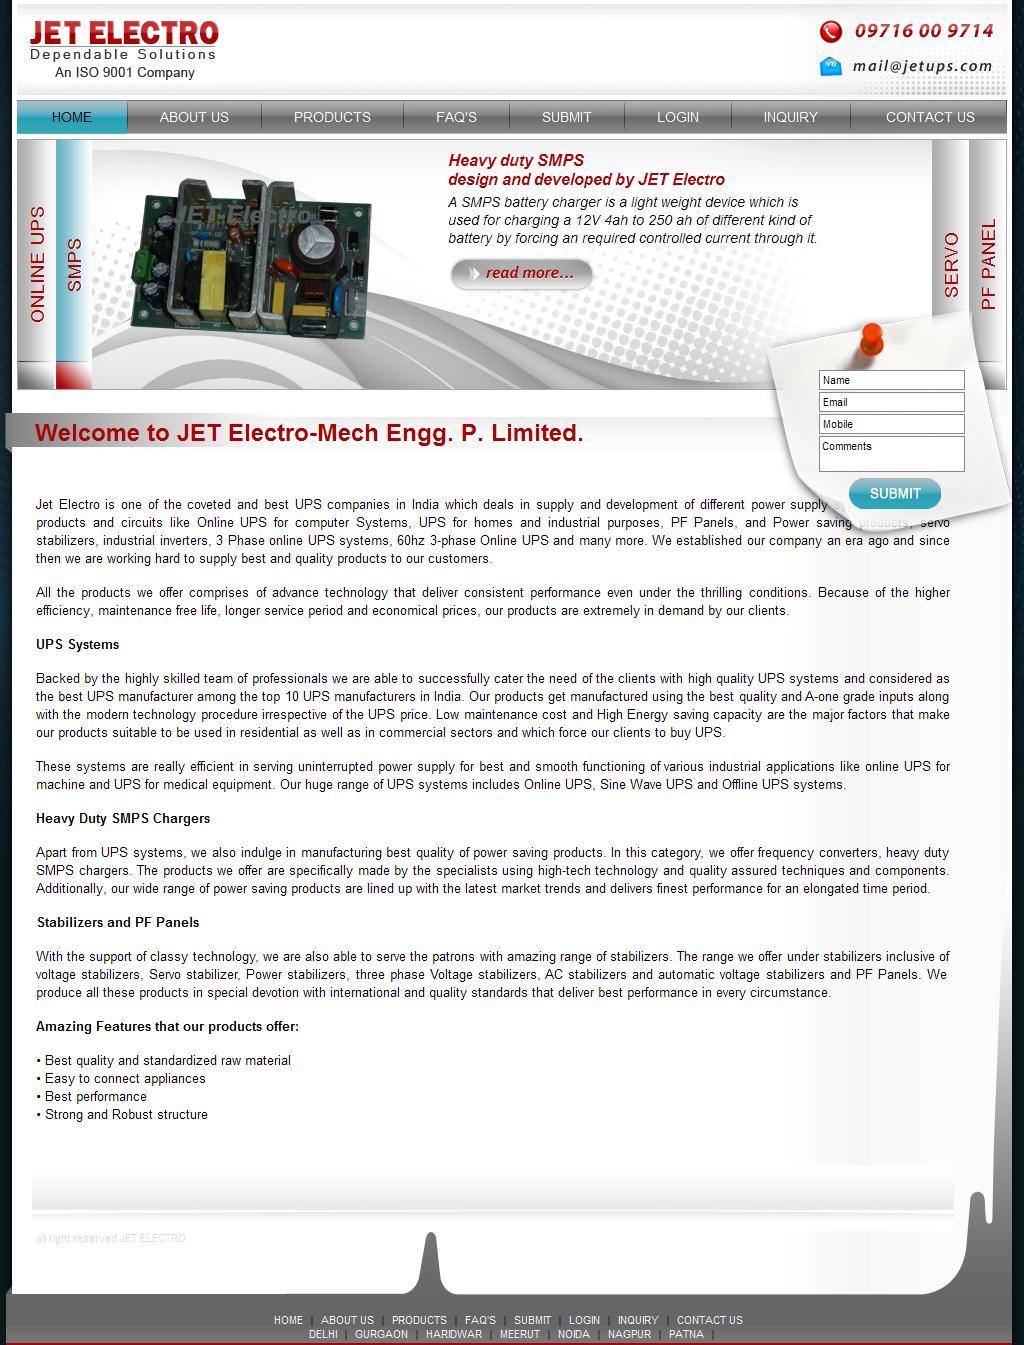 JET-Electro : UPS Delhi, UPS & SMPS Manufacturer, Online UPS Distributor Company   Noida, Gurgaon, Ghaziabad, Sahibabad, Faridabad, Meerut, Patna & Nagpur